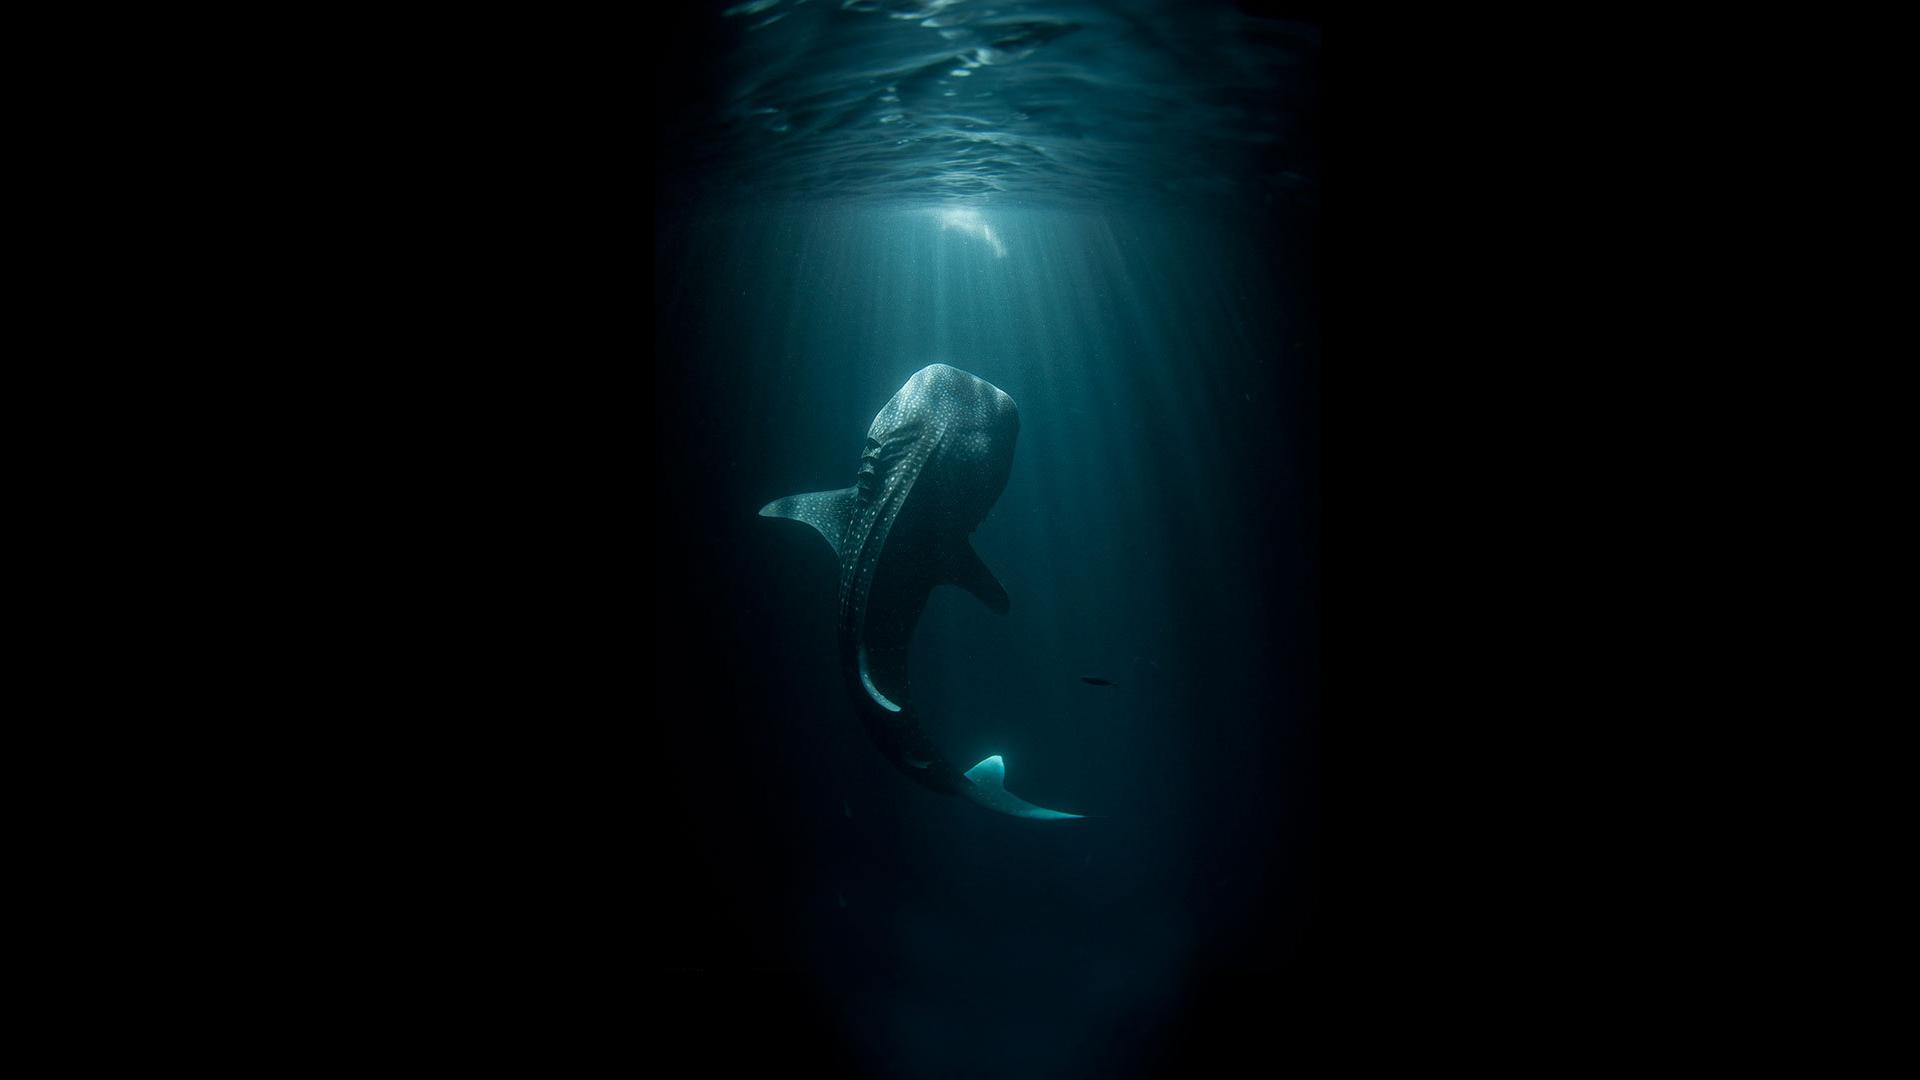 Whale Black Fish Underwater Ocean HD wallpaper creative and 1920x1080